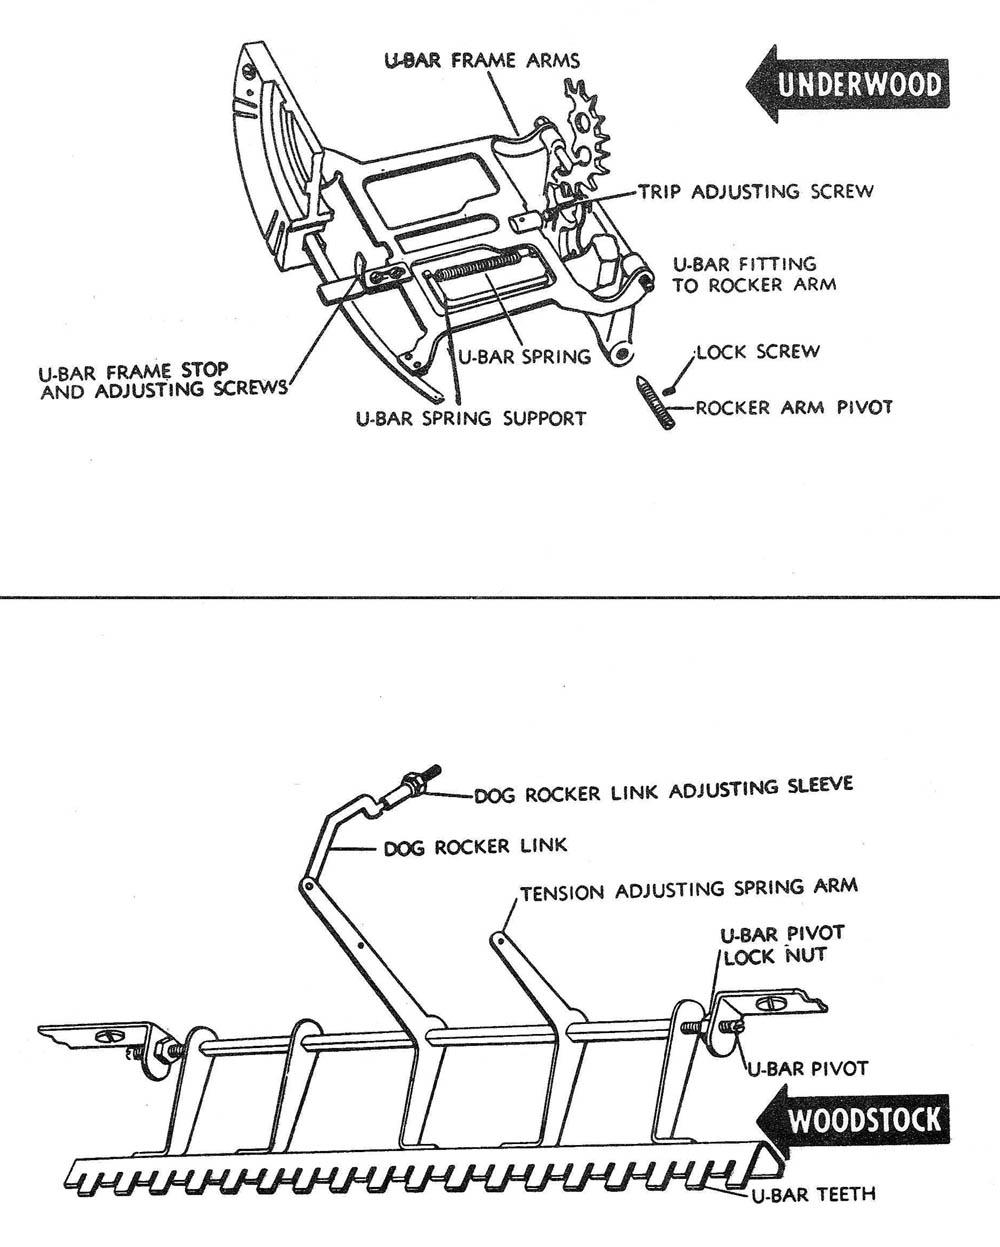 Universal Bar AMES OAMI Mechanical Training Manual